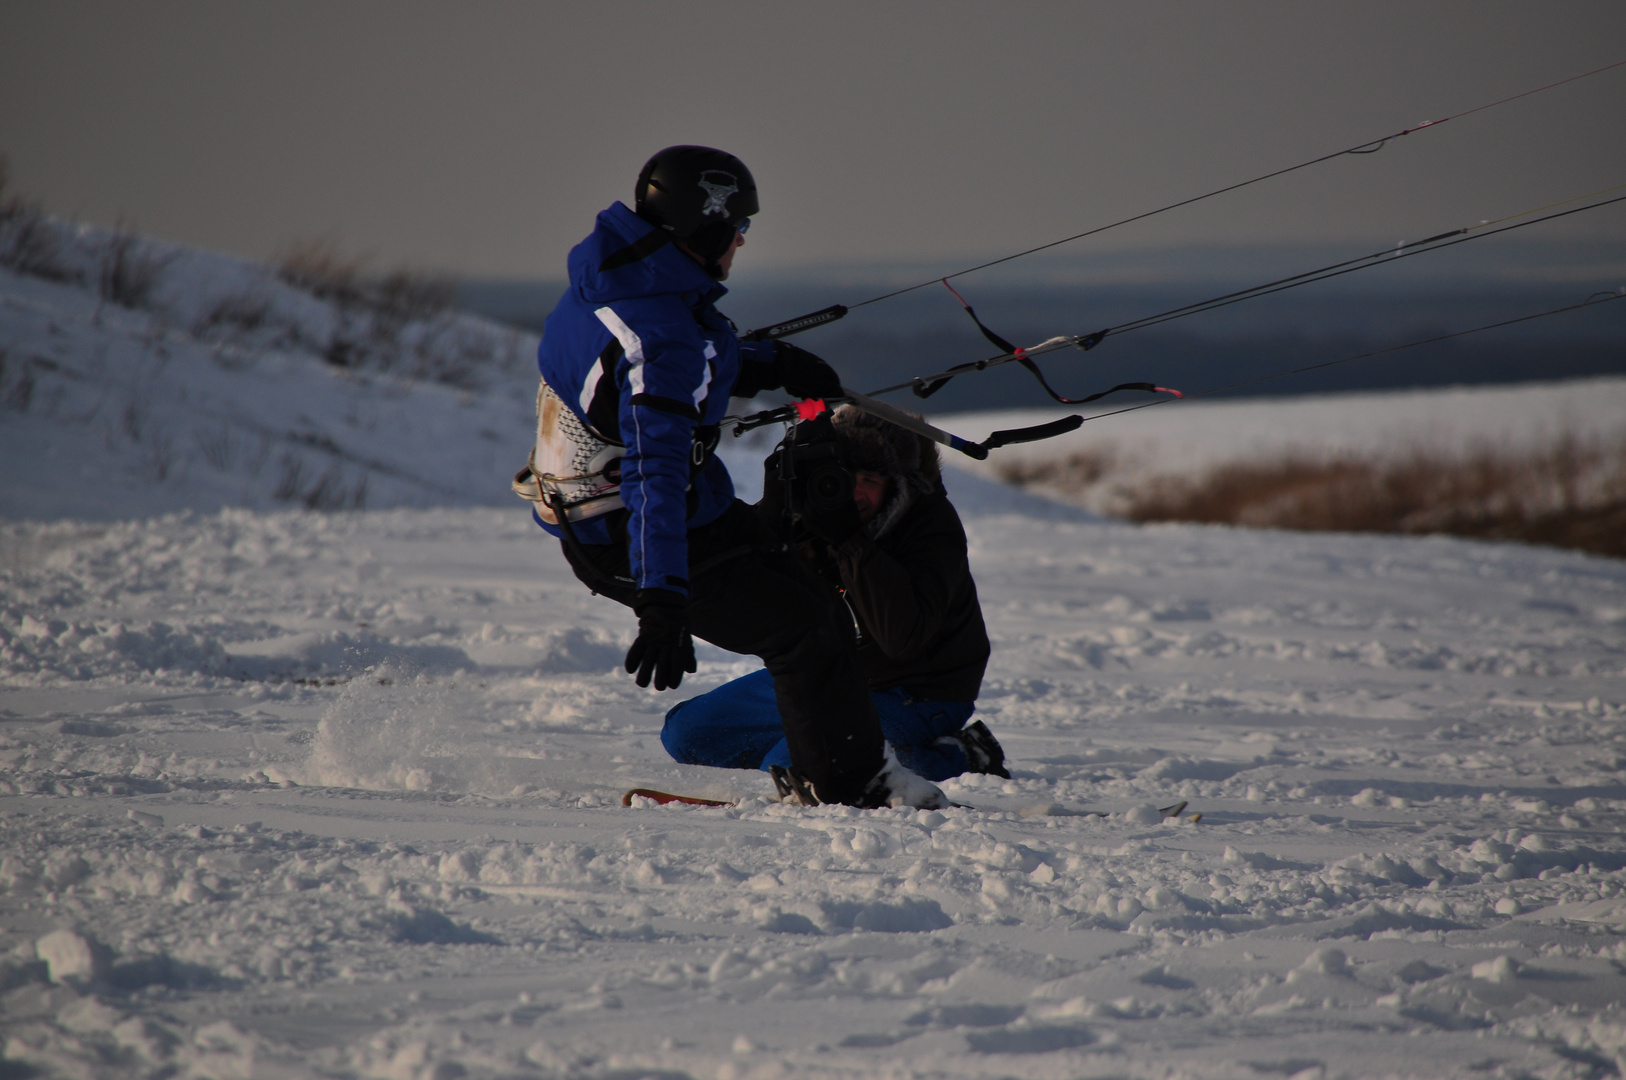 Fotoshooting beim Snowkiten